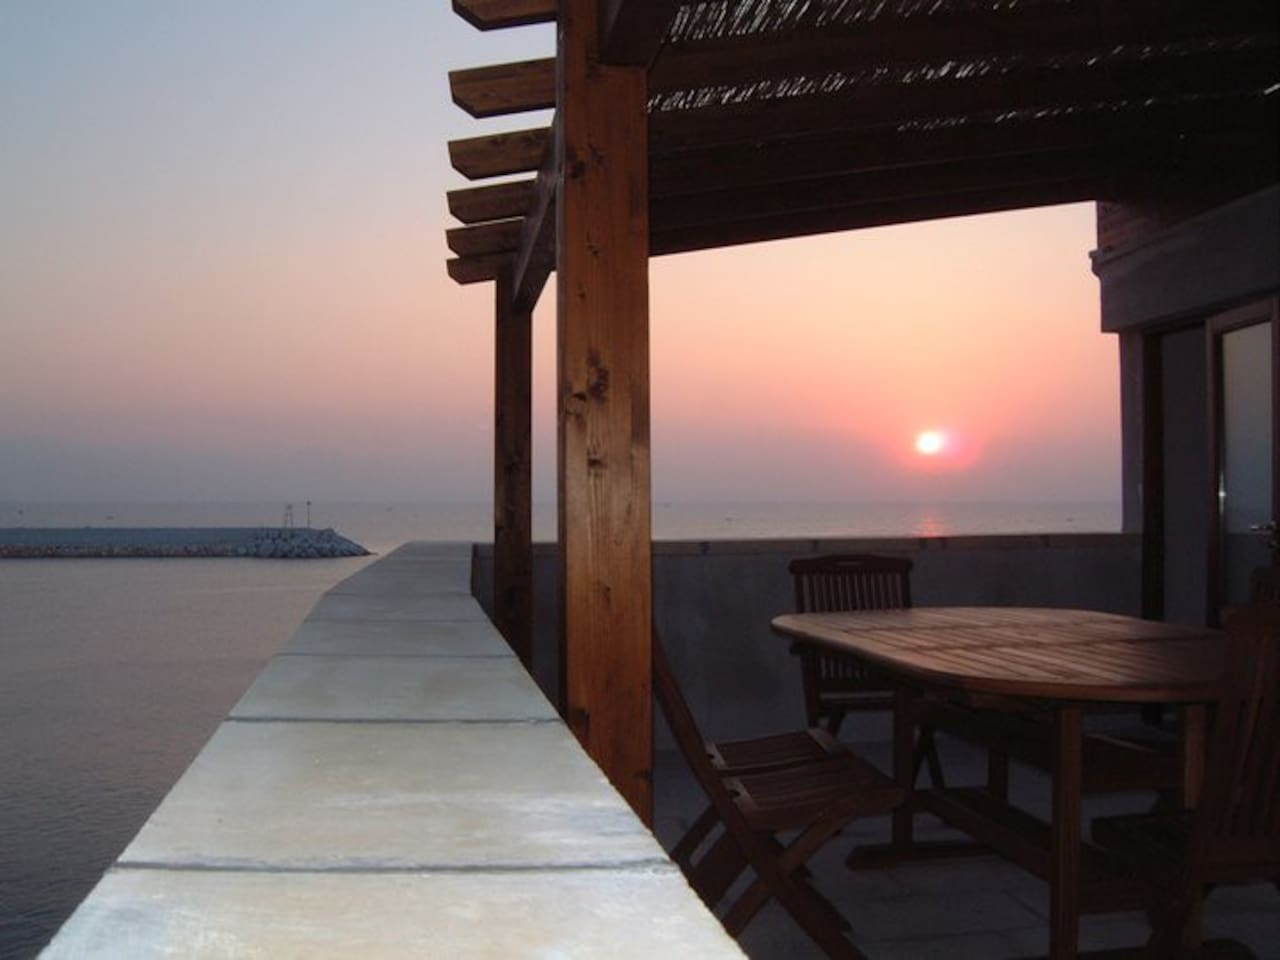 sunrise on terrazza